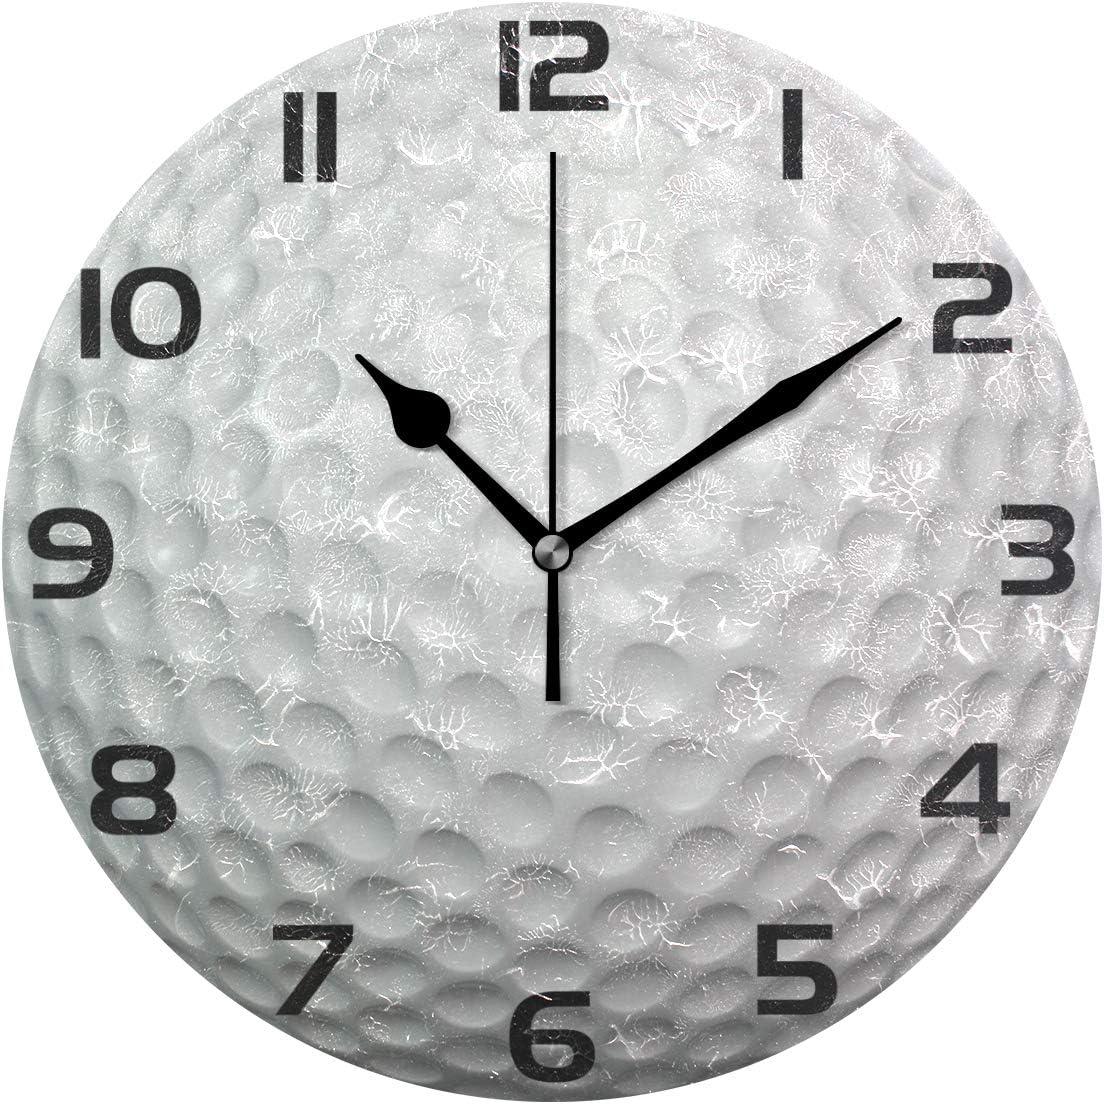 ALAZA Golf Ball Clock Acrylic Painted Silent Non-Ticking Round Wall Clock Home Art Bedroom Living Dorm Room Decor